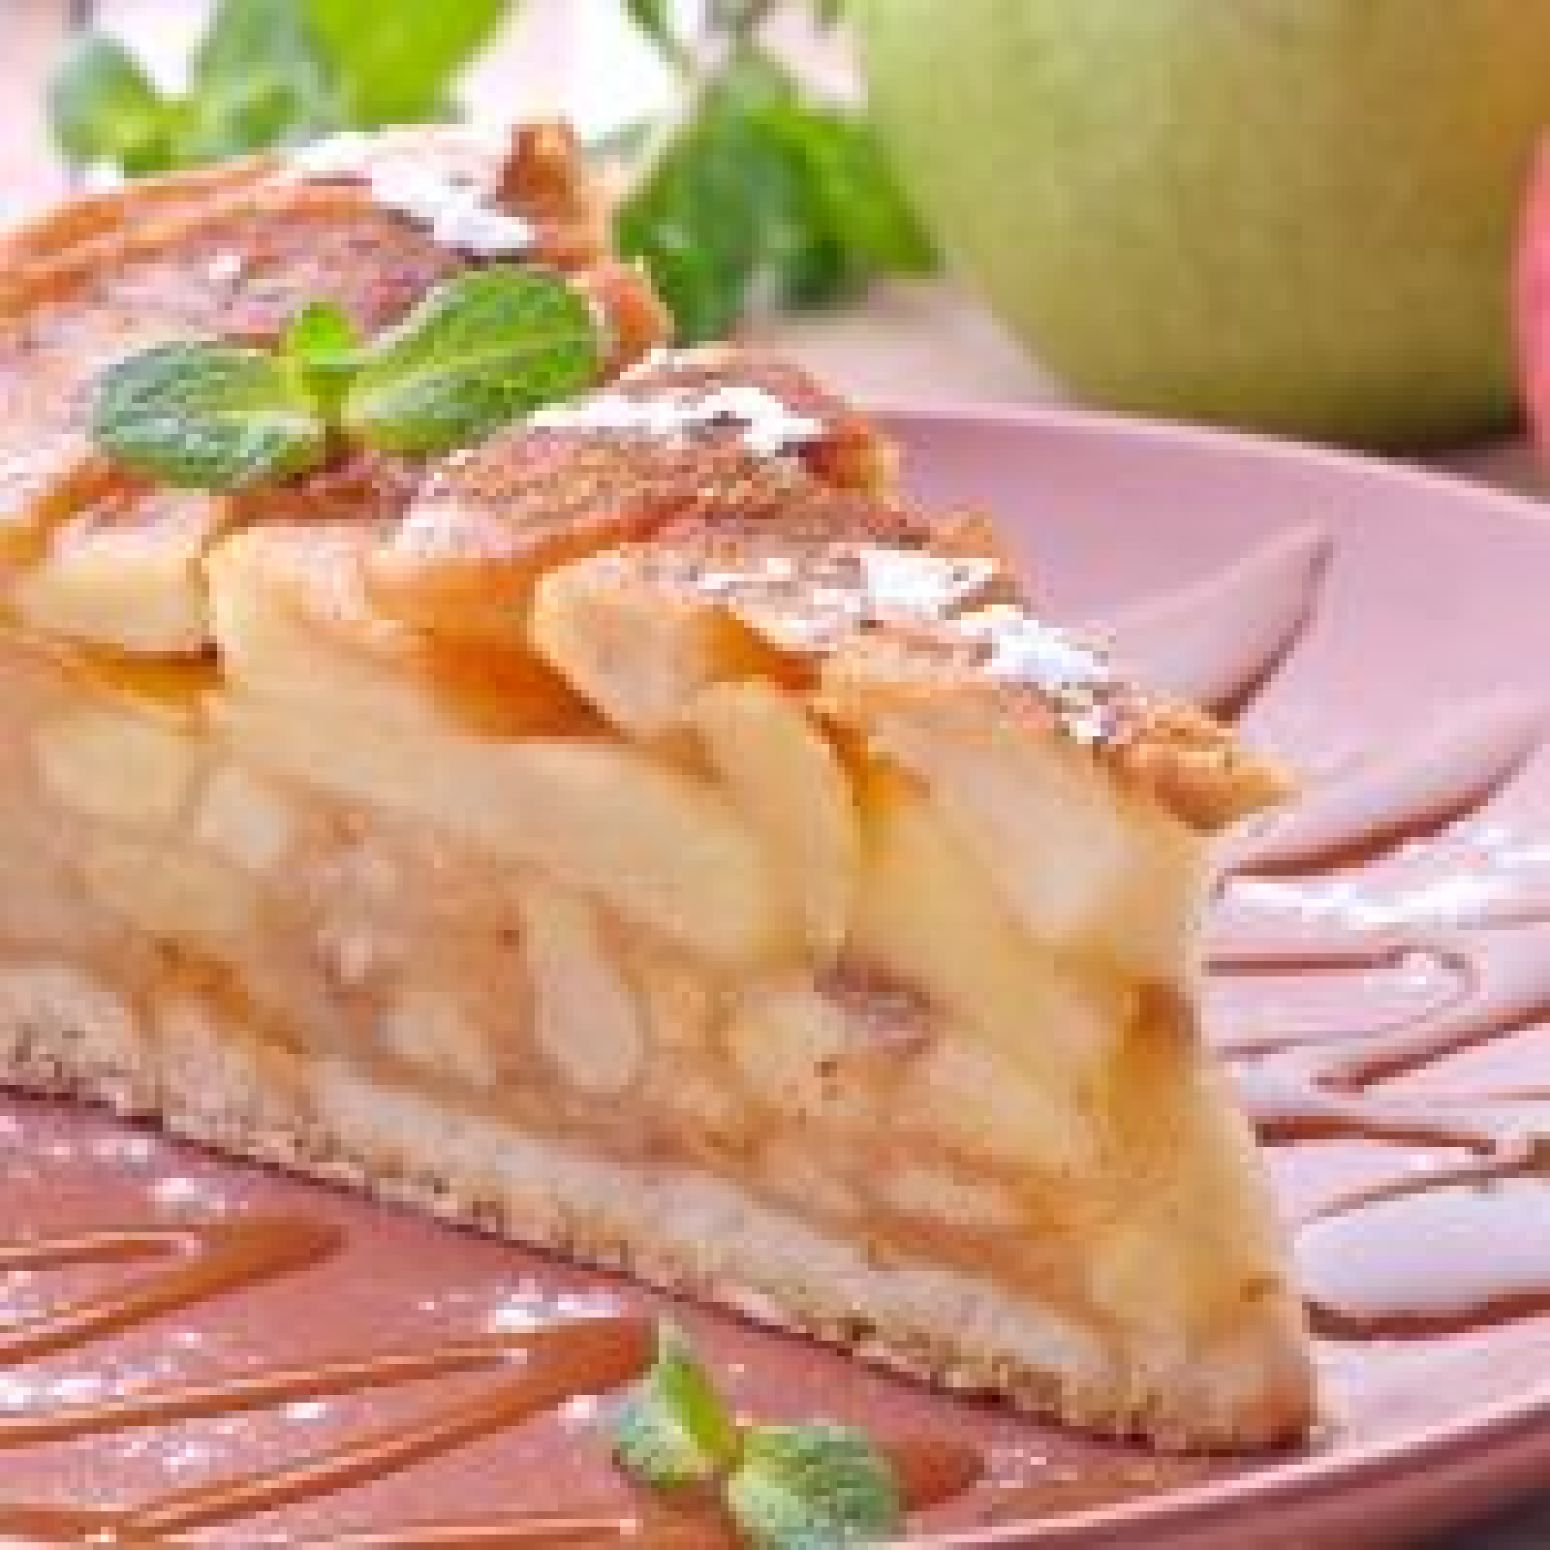 Cracker barrel apple butter copycat recipe